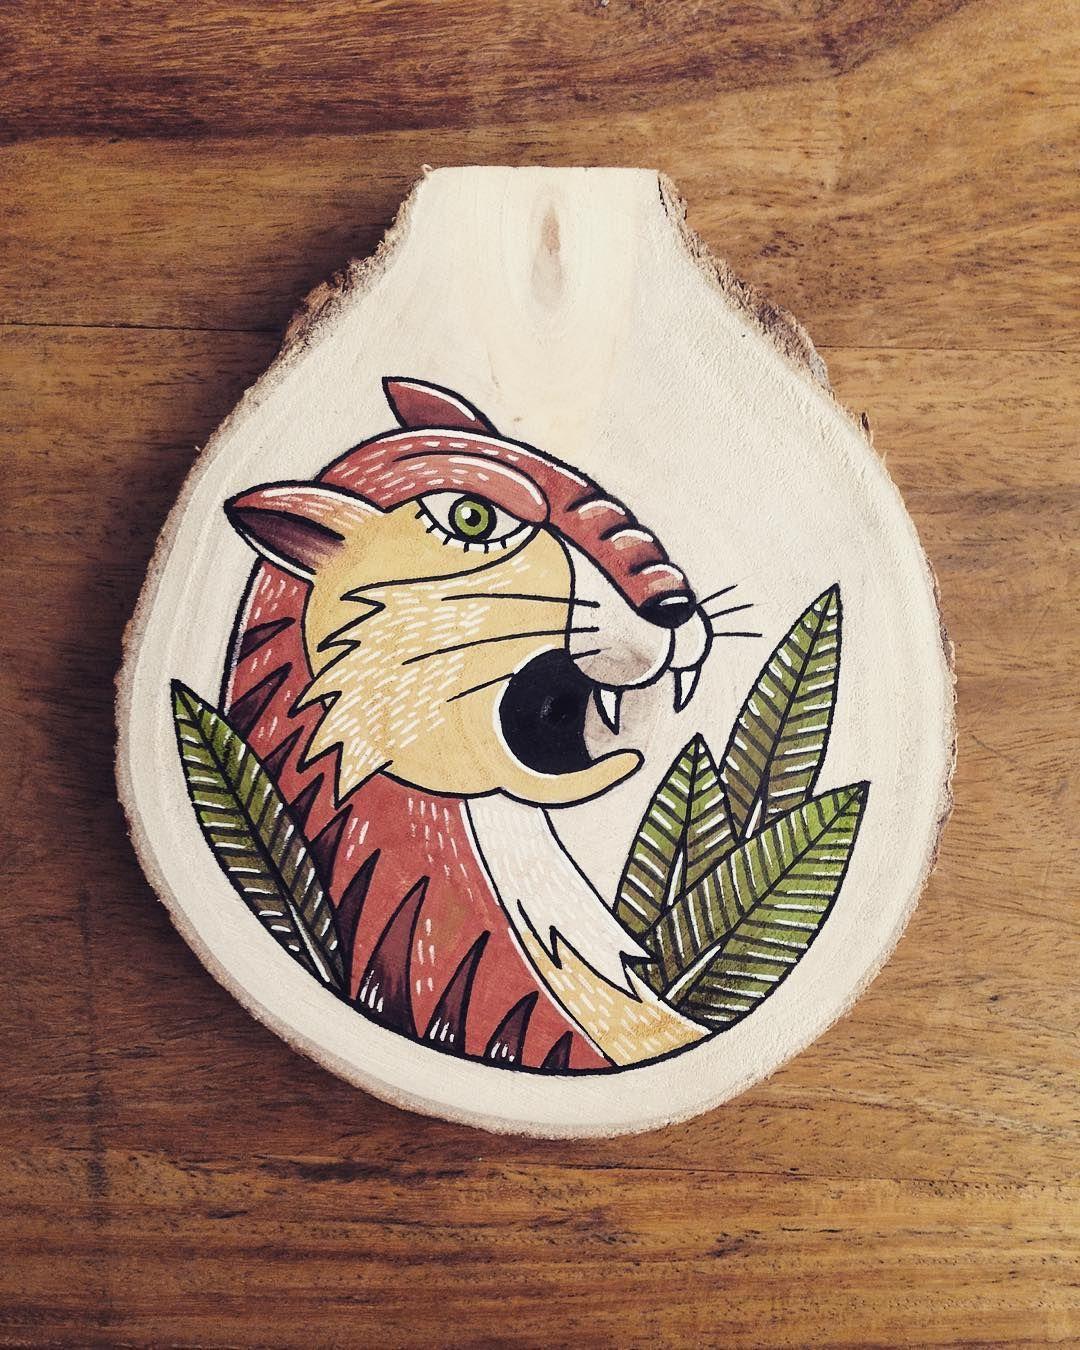 Tiger. #blackboozeillustrations#wood#art#tattooart#drawing#gift#christmas#leaves#animal#etsy#illustration